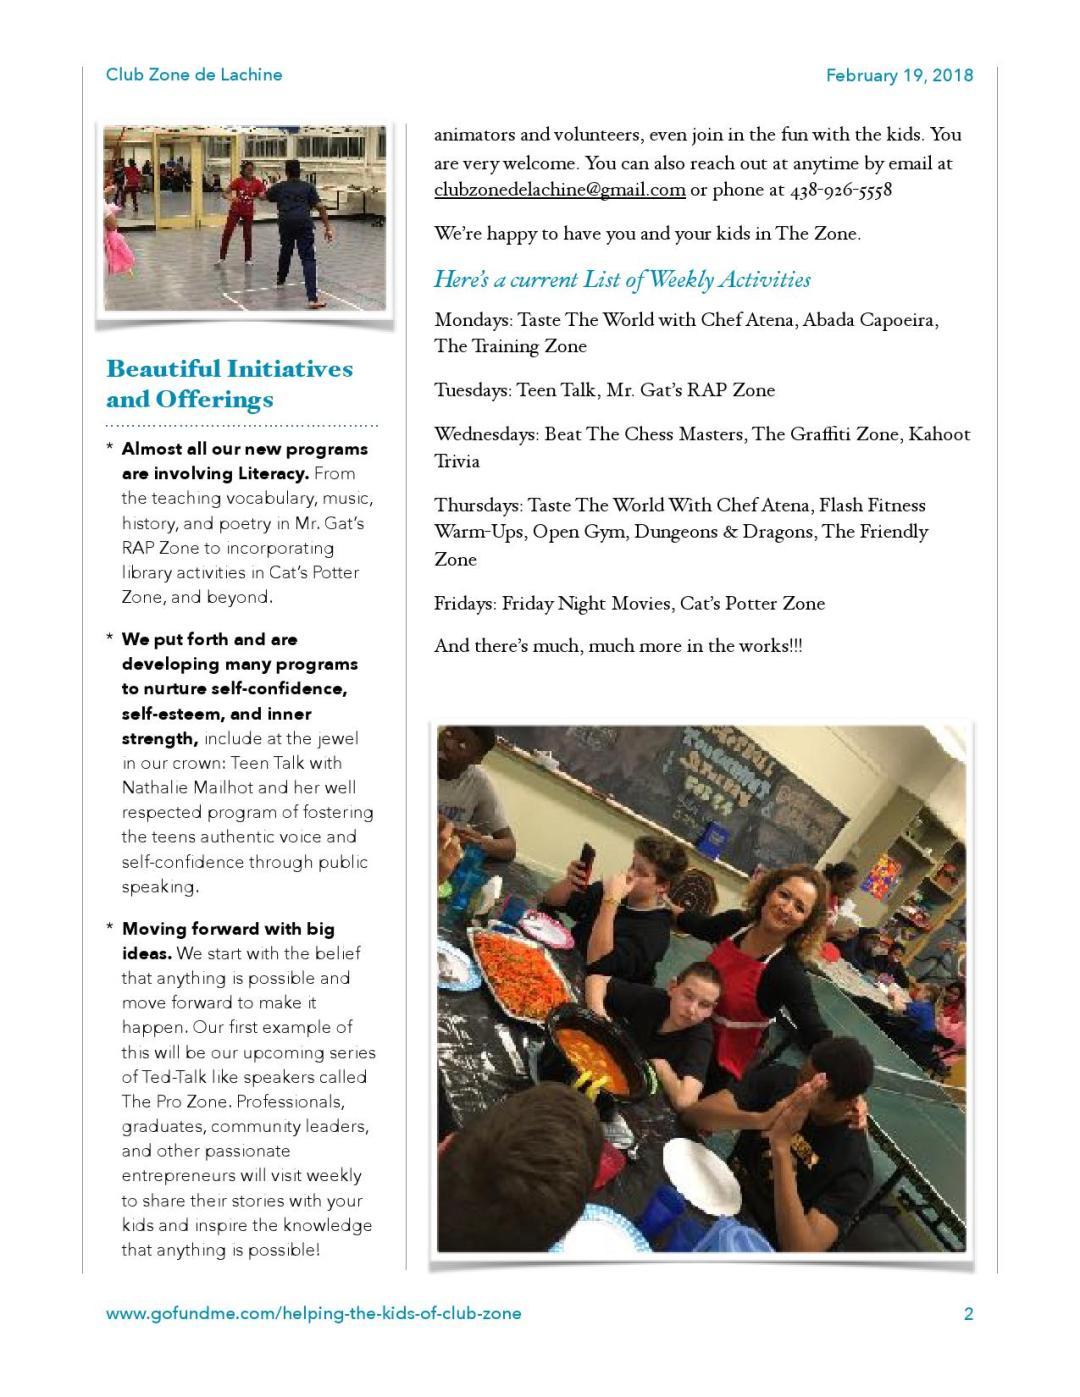 Club Zone Newsletter 2018-02-19_000002